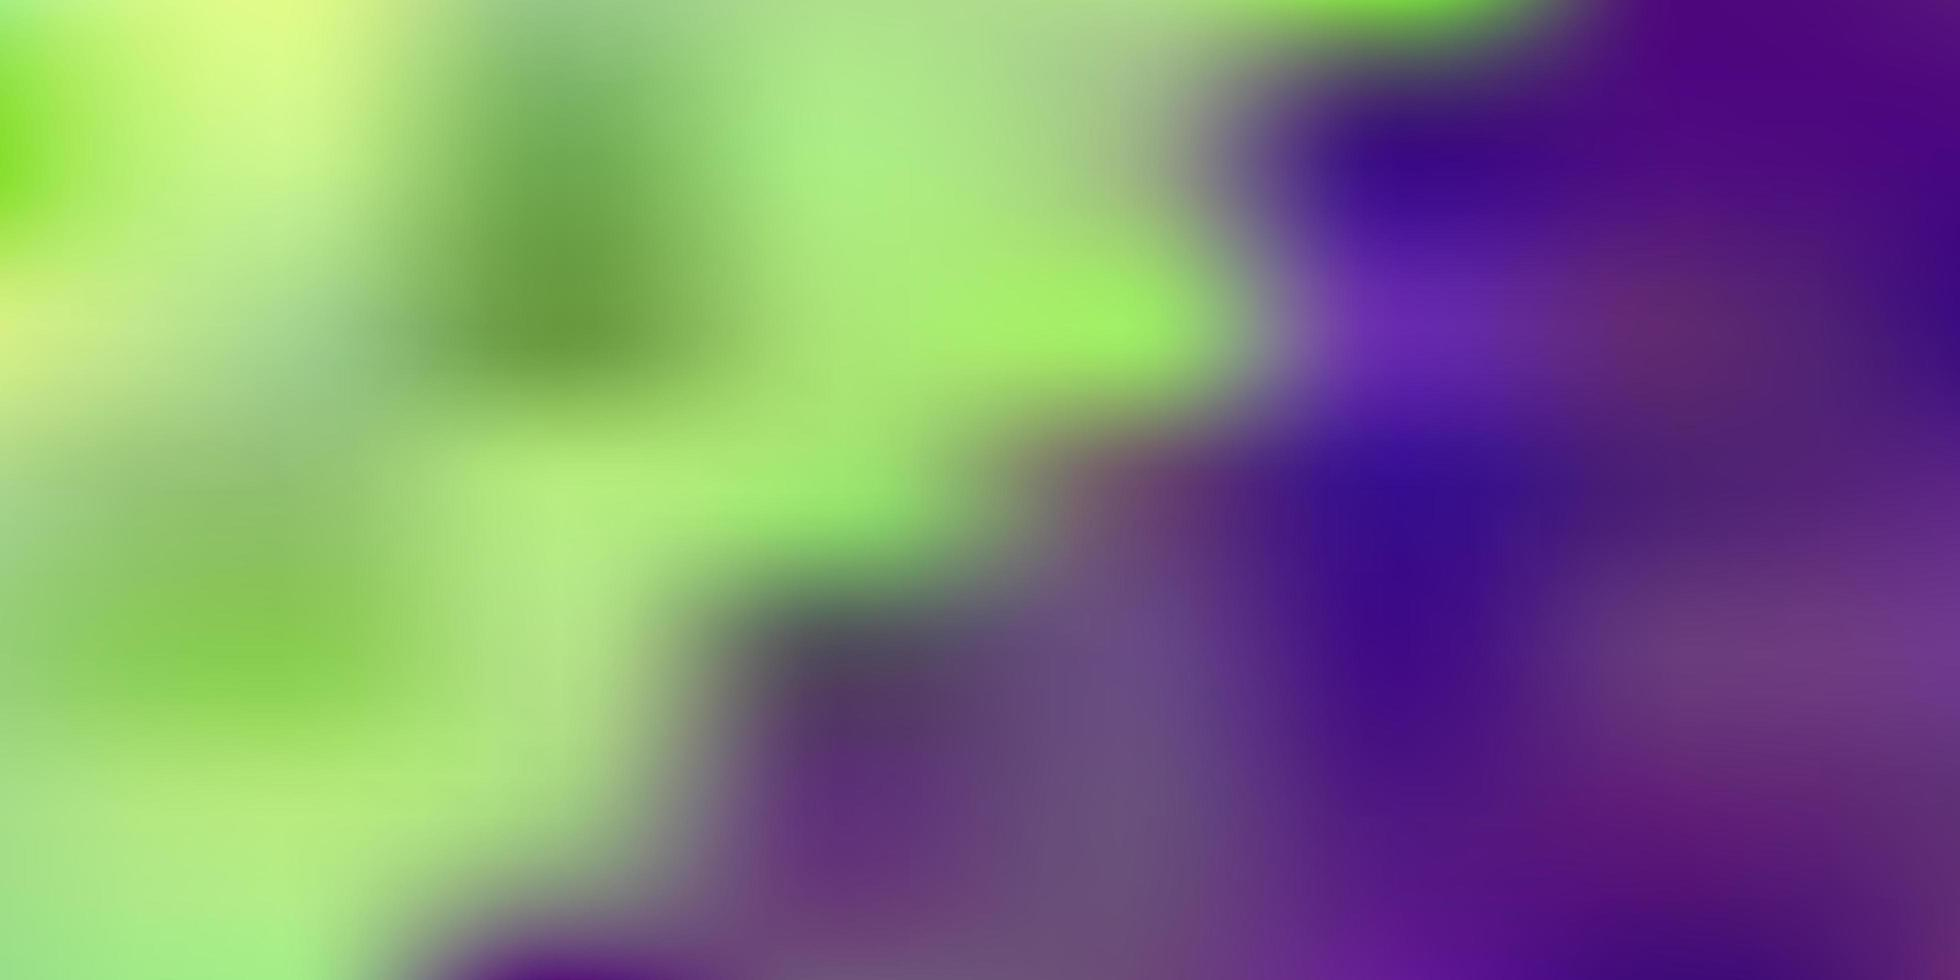 Hellpurpurne Vektorunschärfe Layout. vektor